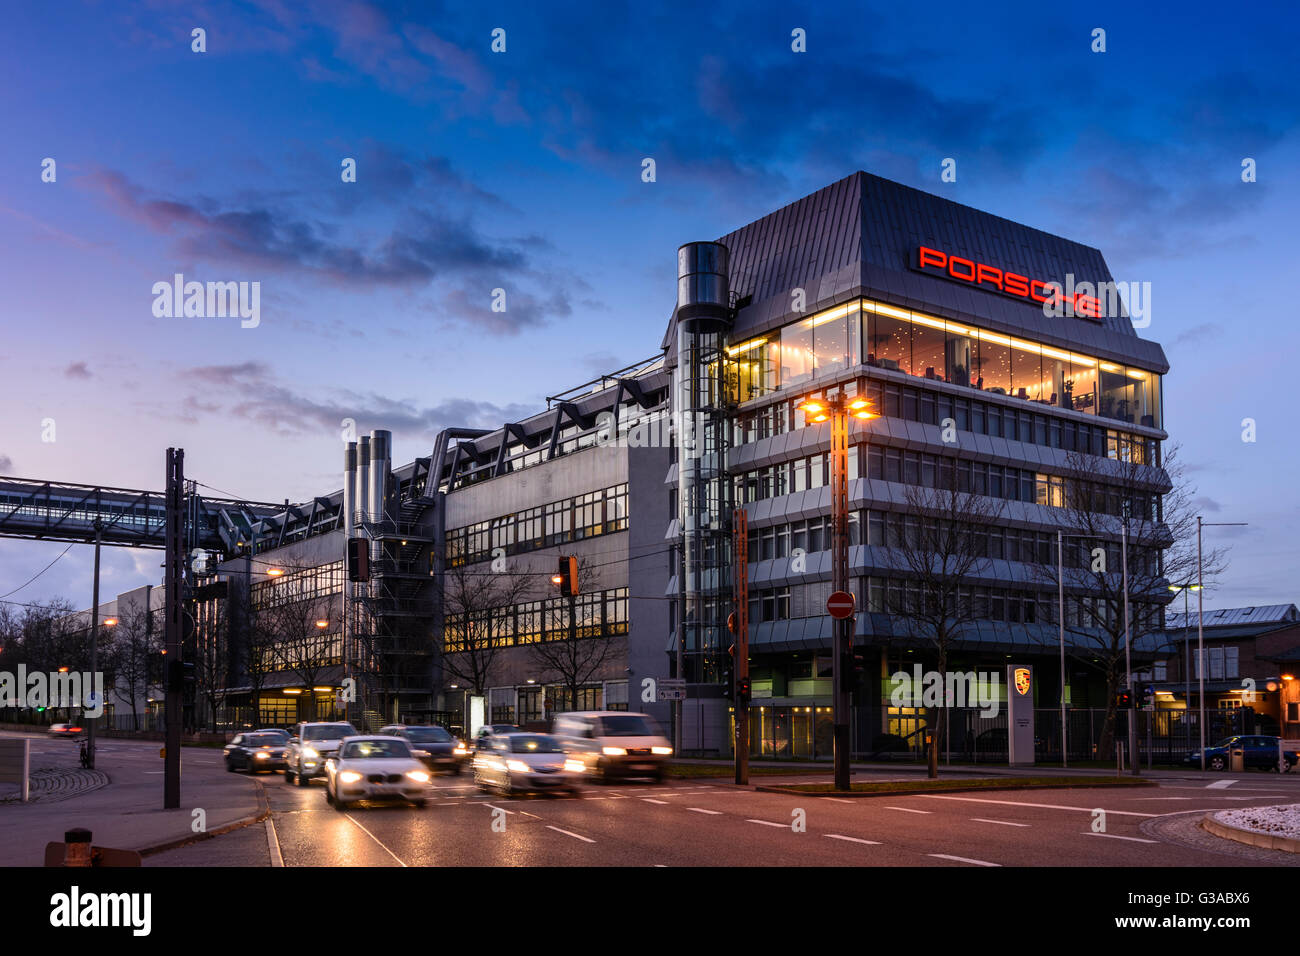 Porsche Factory And Headquarters In Zuffenhausen Germany